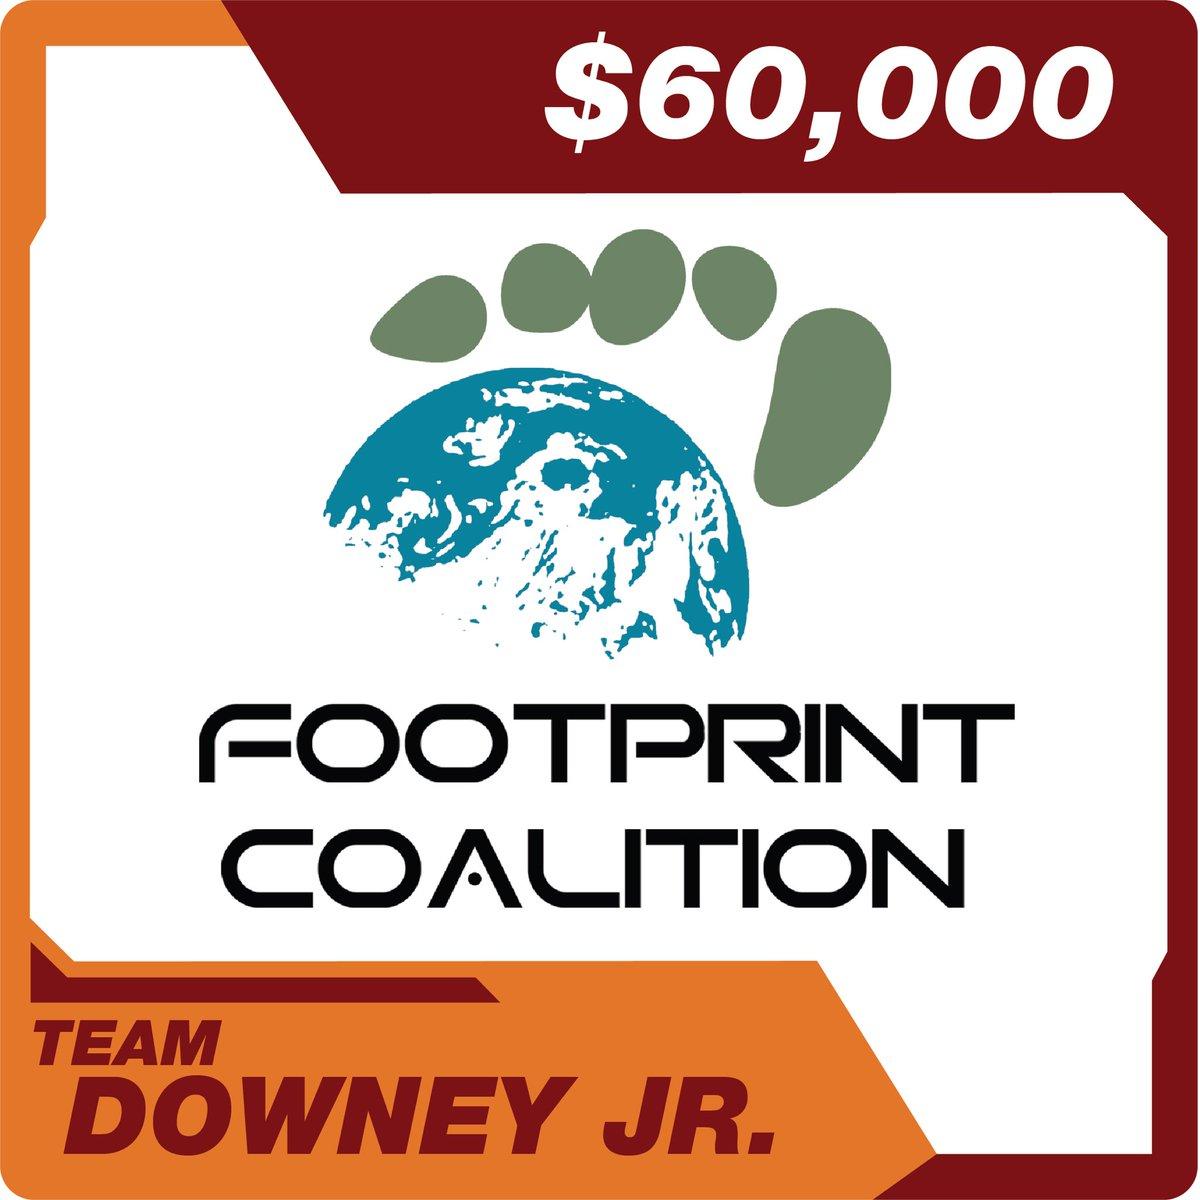 #TeamDowneyJr @RobertDowneyJr @fp_coalition